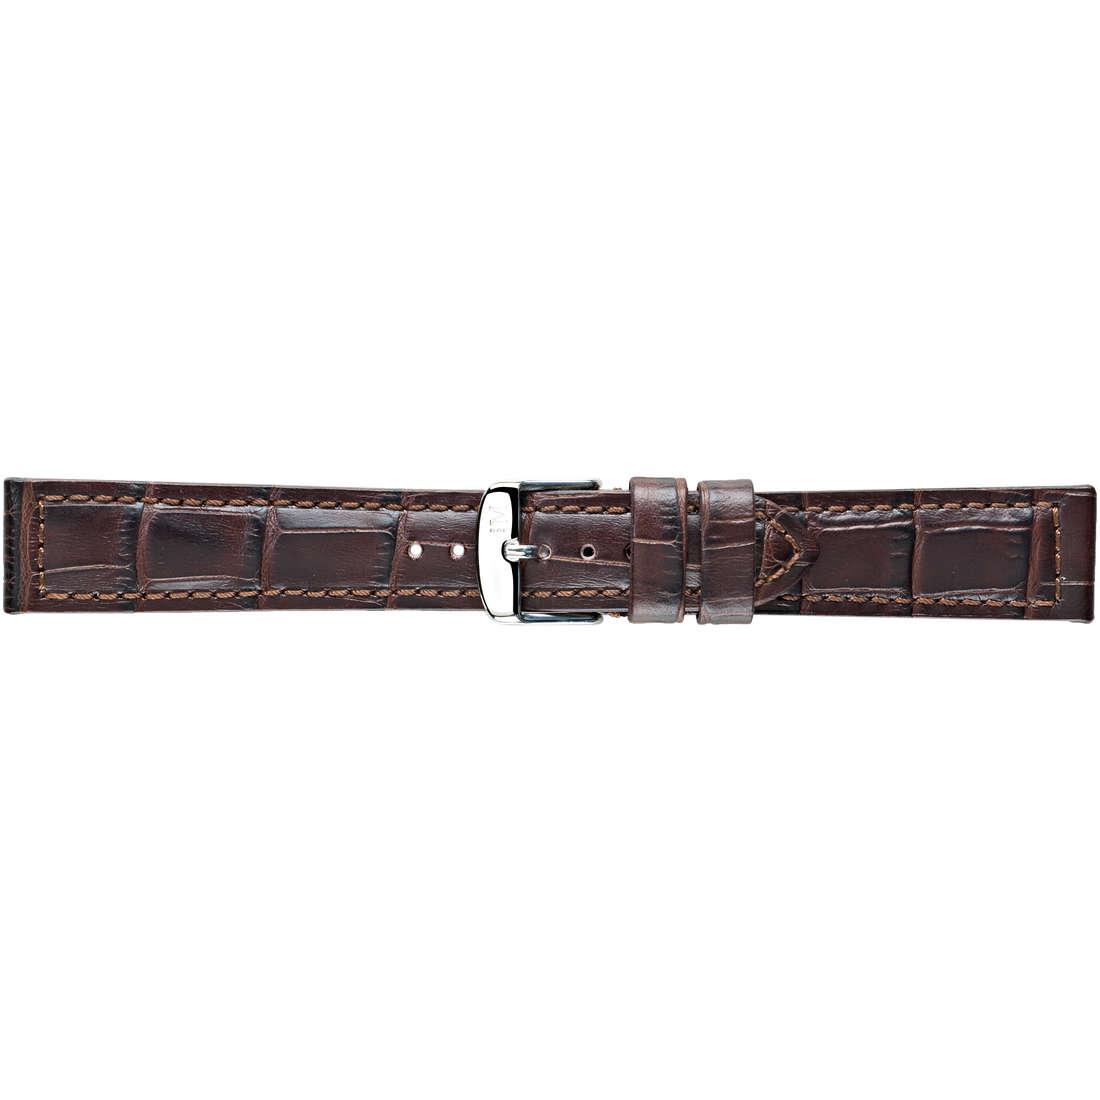 watch watch bands watch straps man Morellato Manufatti A01U2226480032CR24